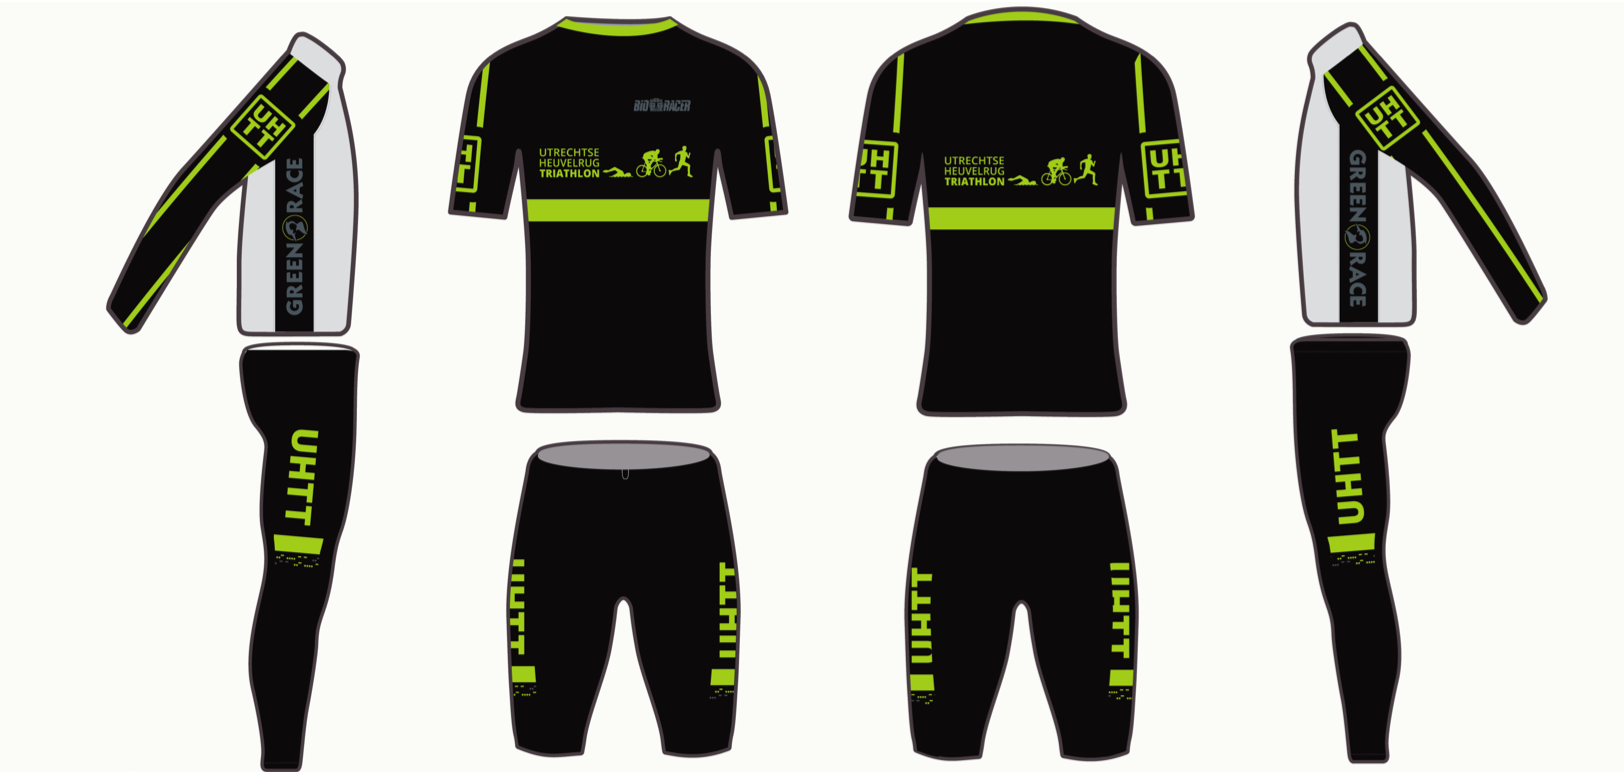 vereniging - UHTT Running gear - UHTT Kleding pakket: kom passen op maandag 22 januari 2018! - update, Planning, kleding, Agenda